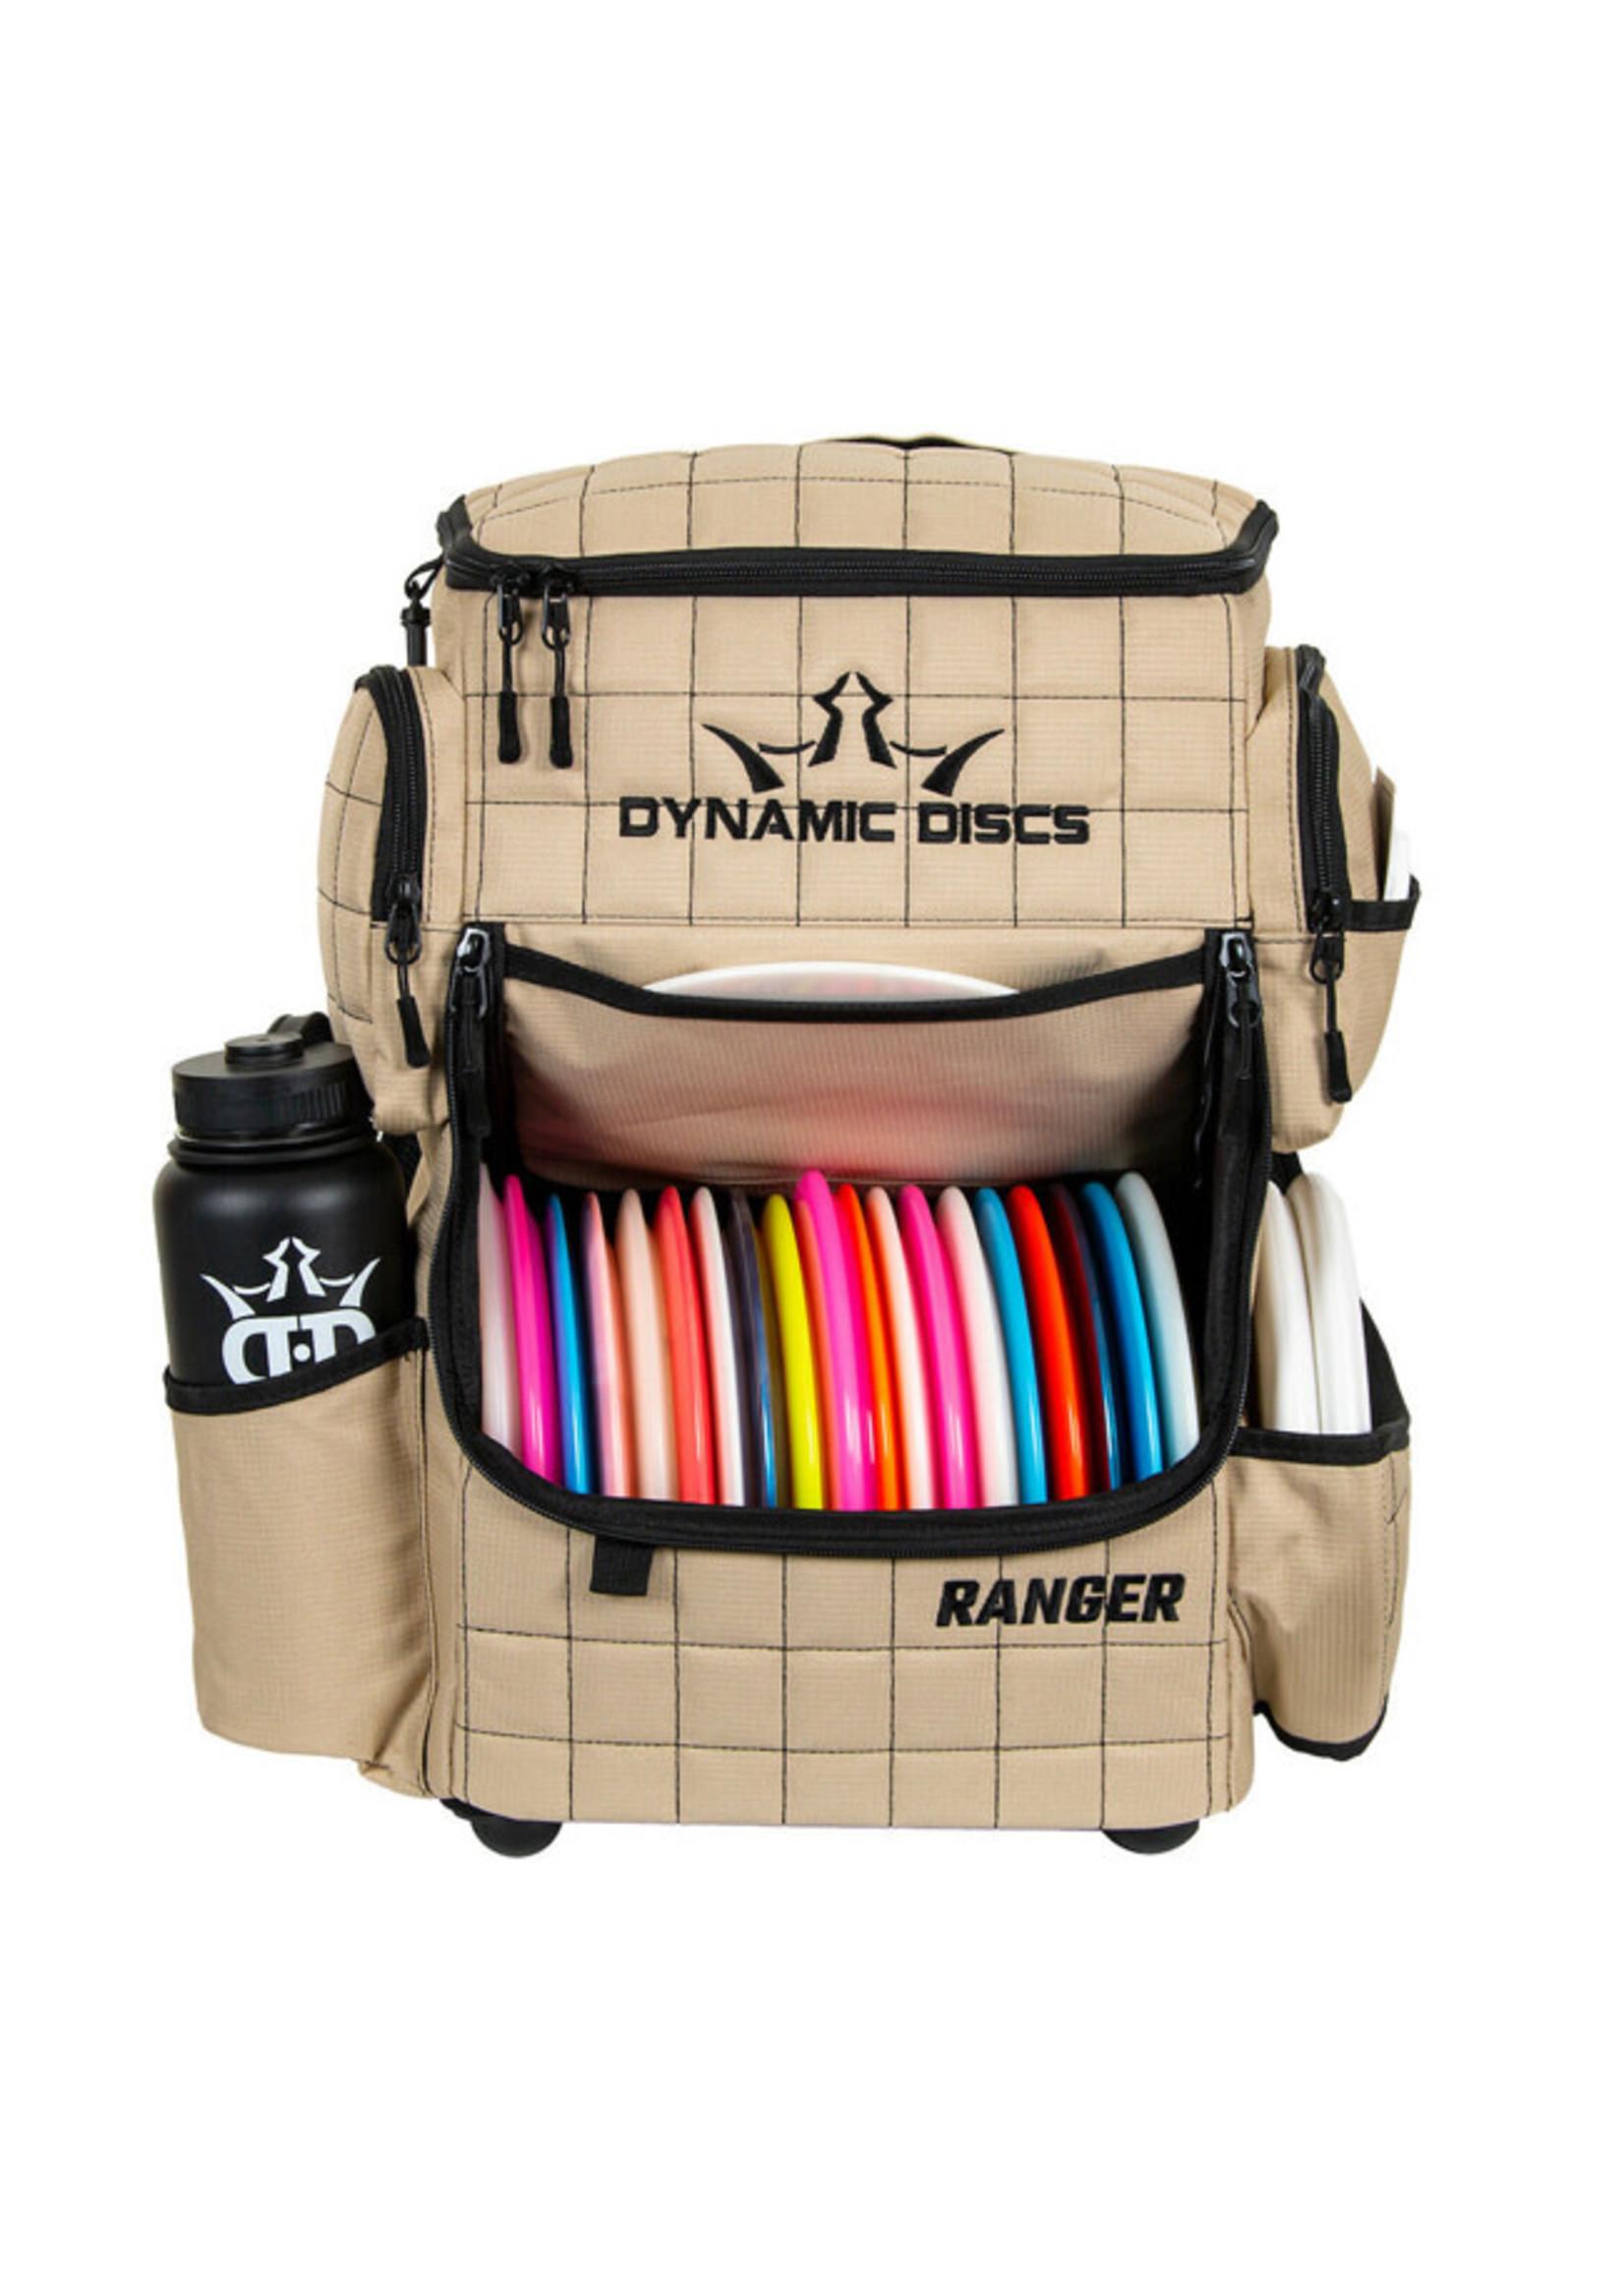 Dynamic Discs Dynamic Discs Ranger Disc Golf Backpack